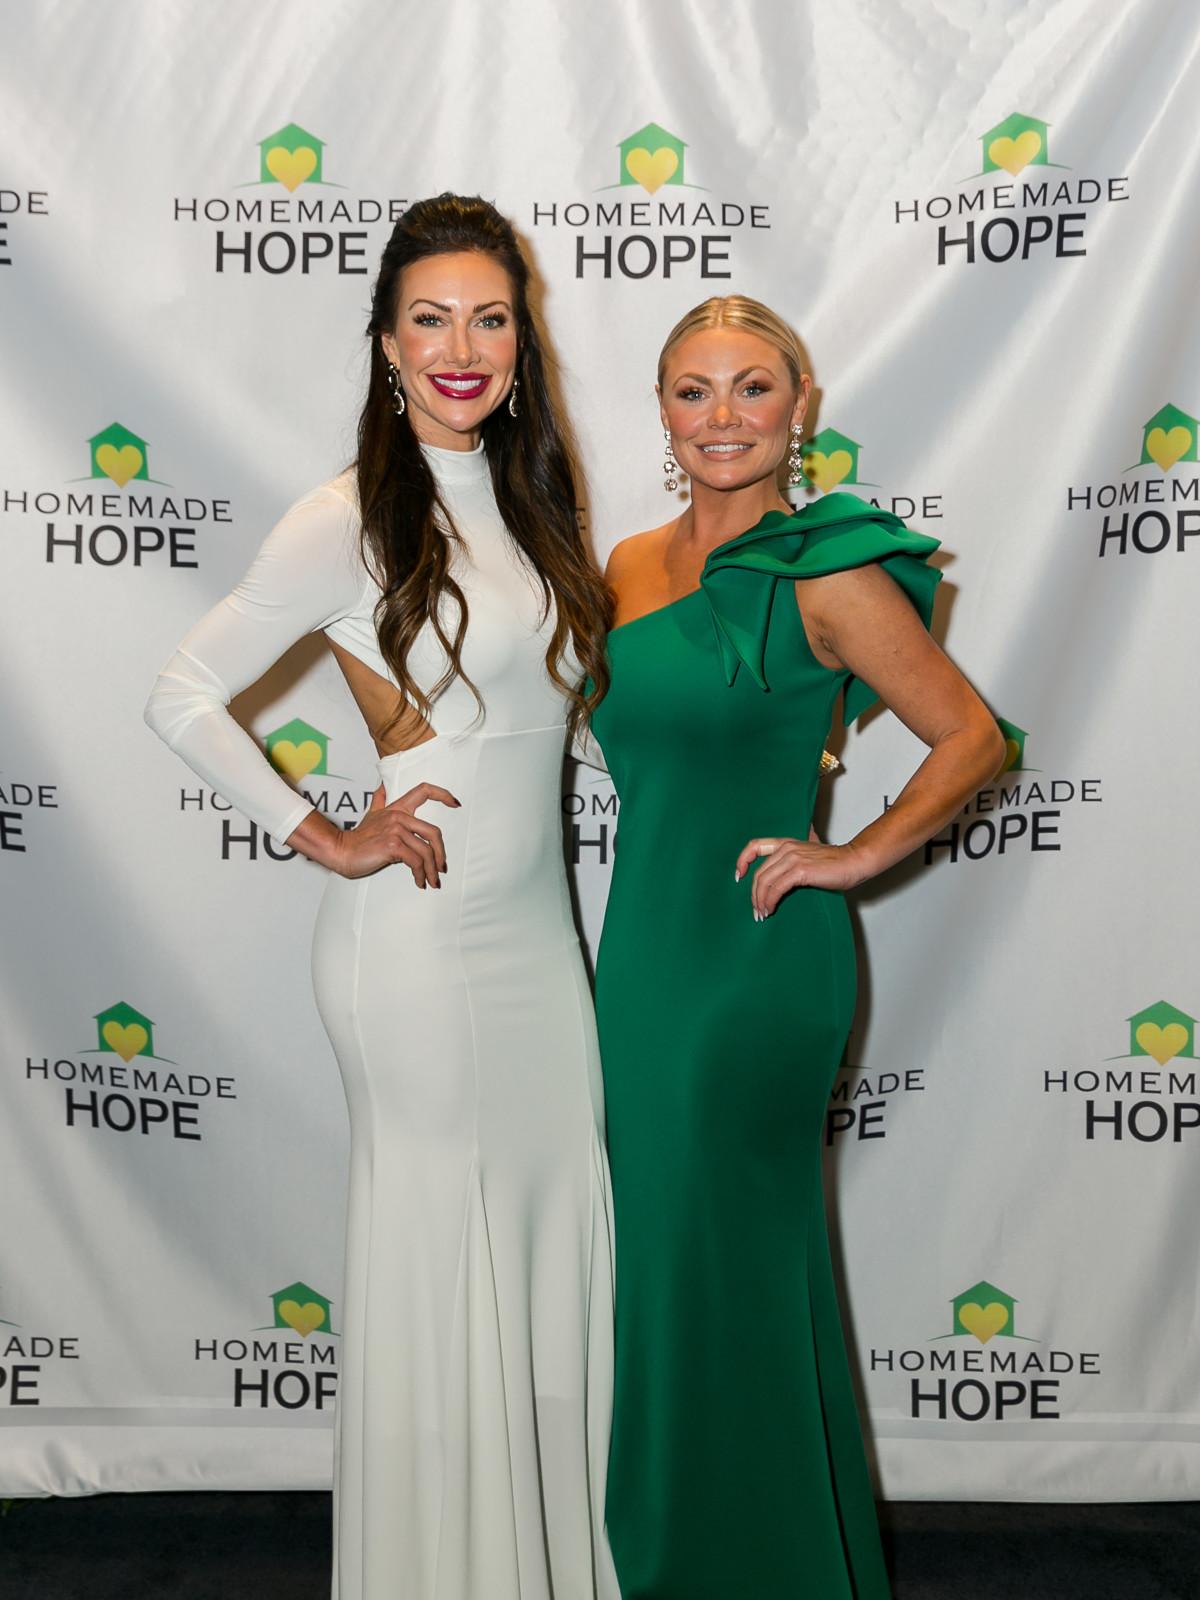 Homemade Hope Gala Ashley Dockall Natalie Gage